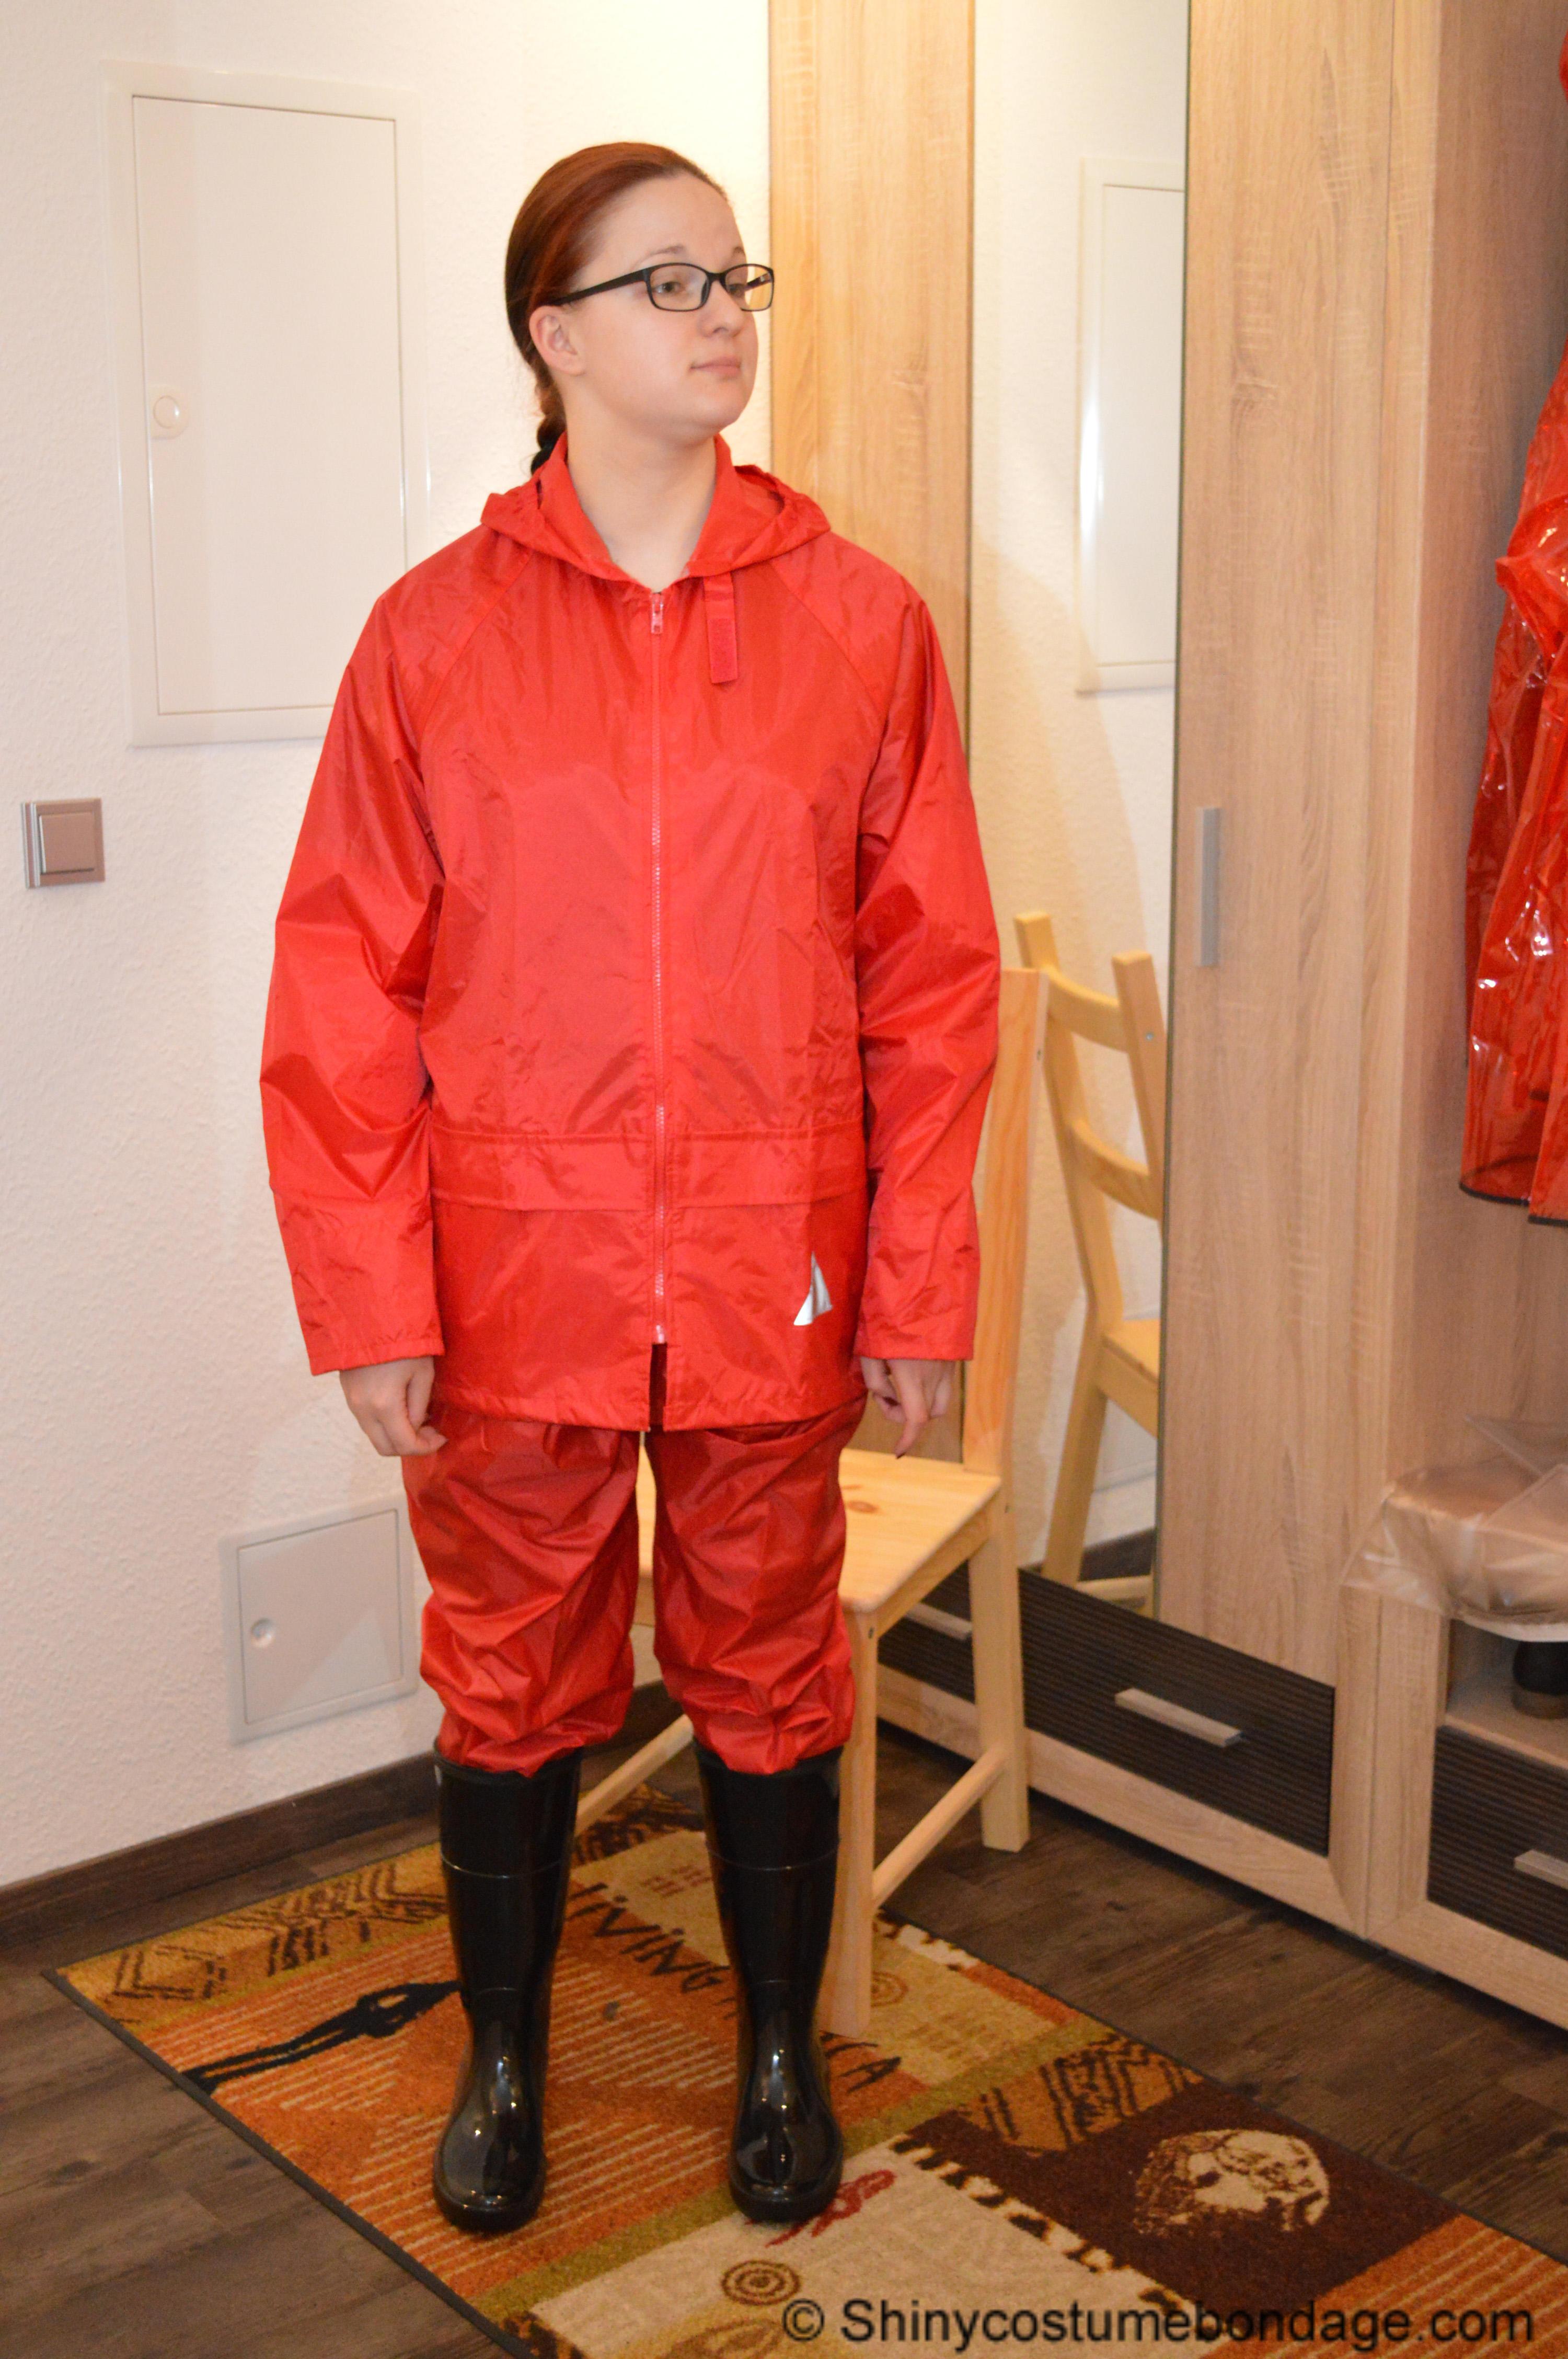 clipspoolcom bondage in red nylon rainwear